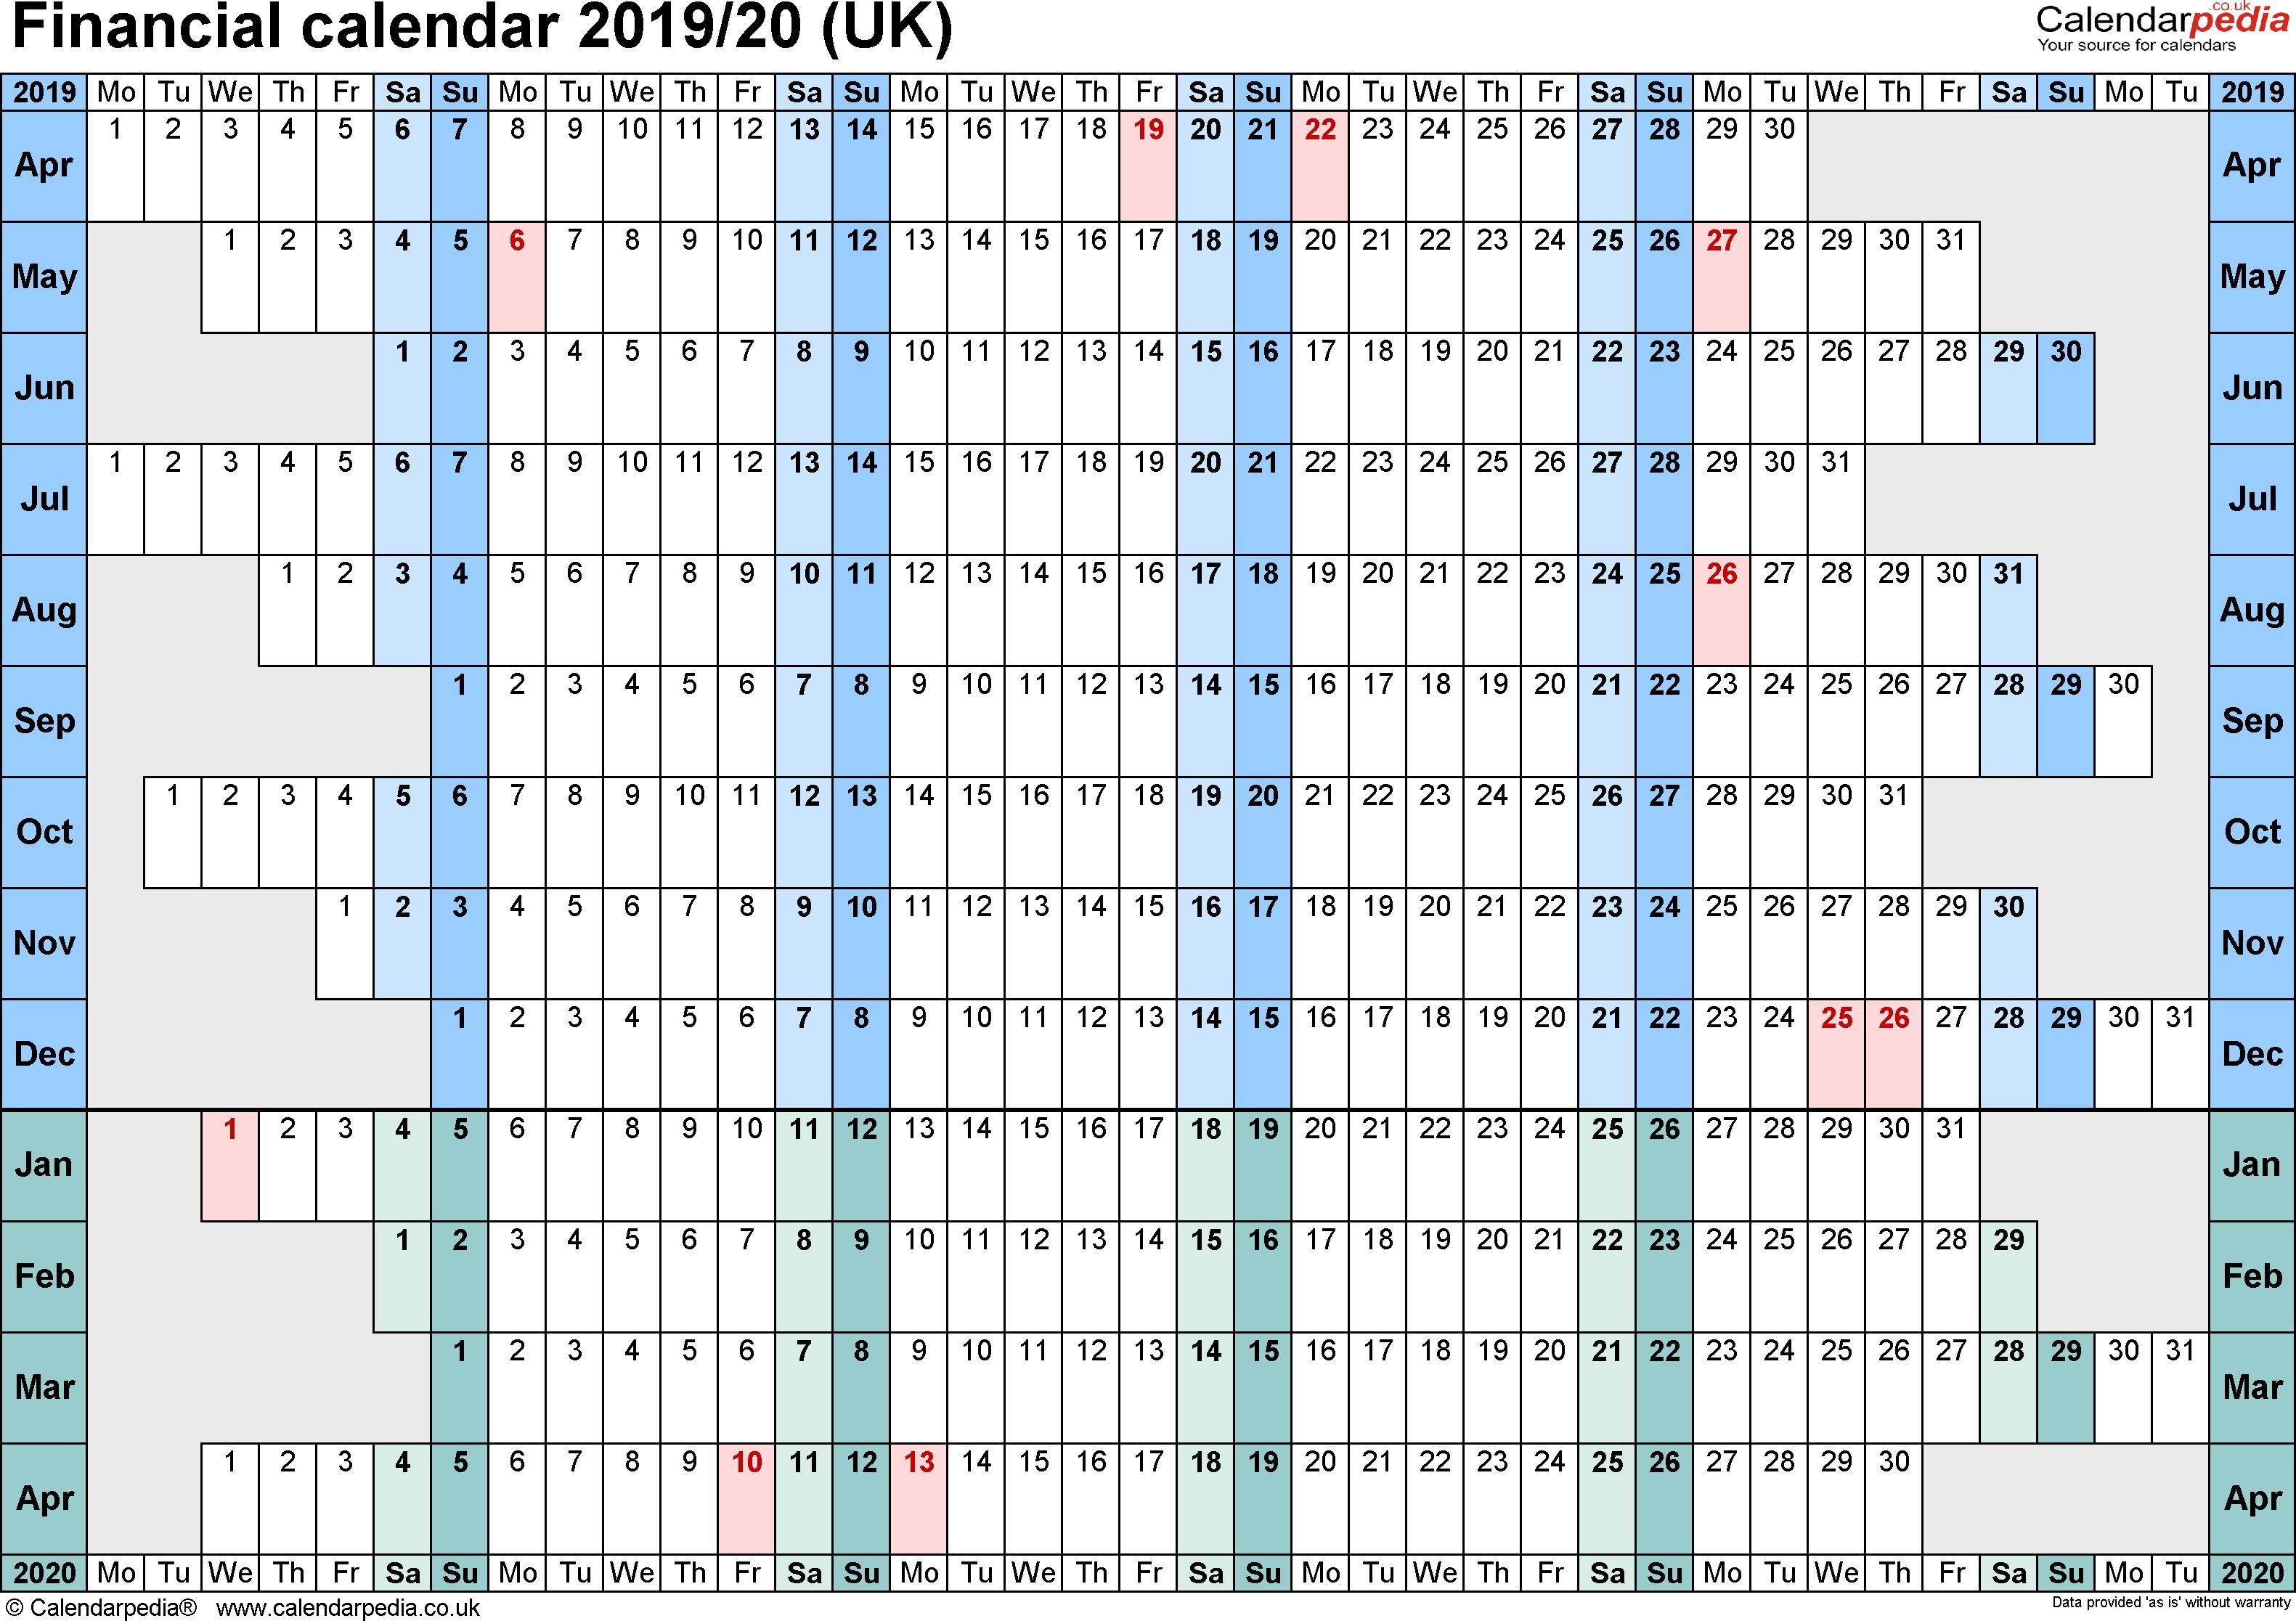 Financial Calendars 2019/20 (Uk) In Pdf Format inside Financial Week Calendar 2019/2020